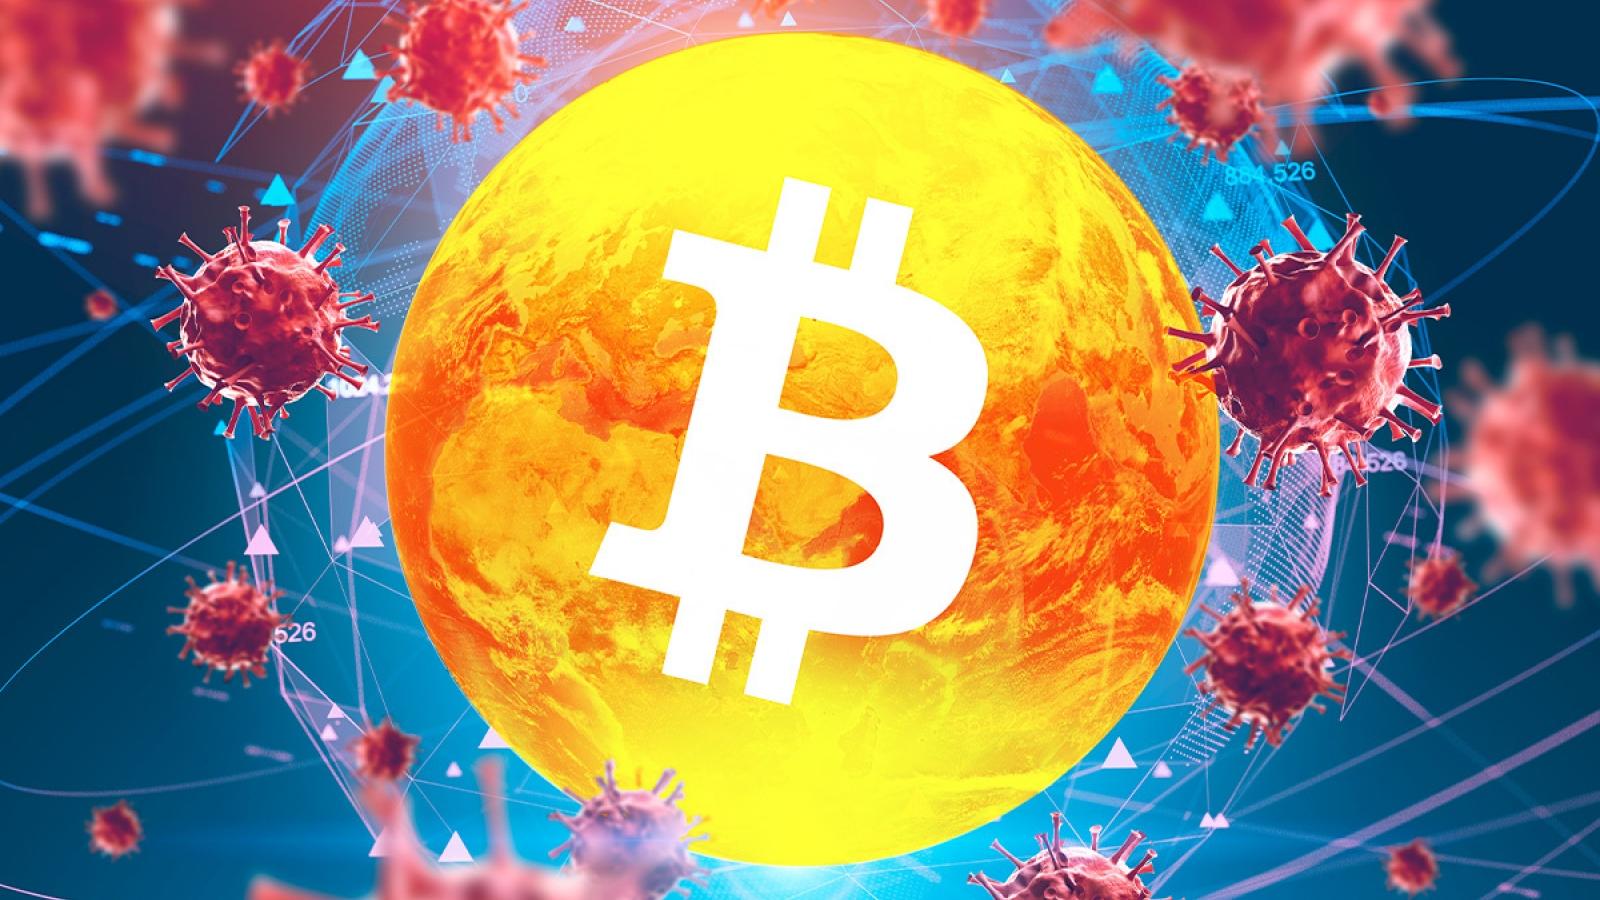 Bitcoin BTC Koronavirüse Yakalandı Durumu Ciddi